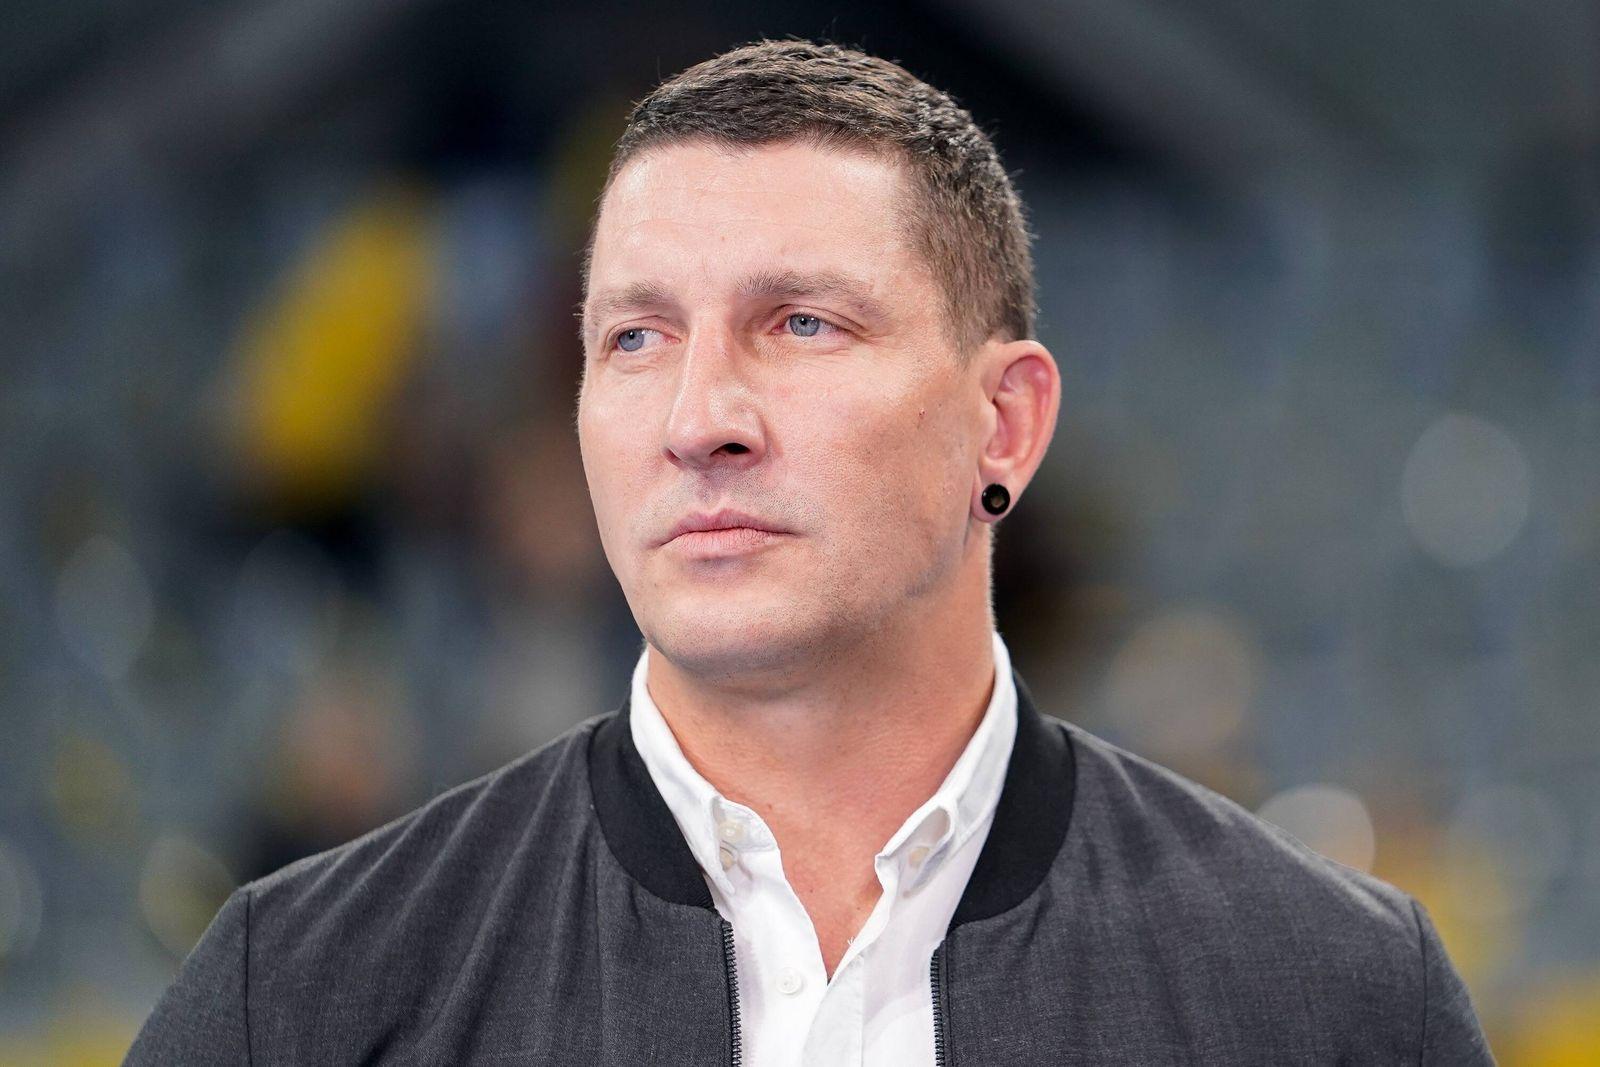 Stefan Kretzschmar TV Experte Einzelbild Aktion Action Porträt Portrait Handball DKB Bund